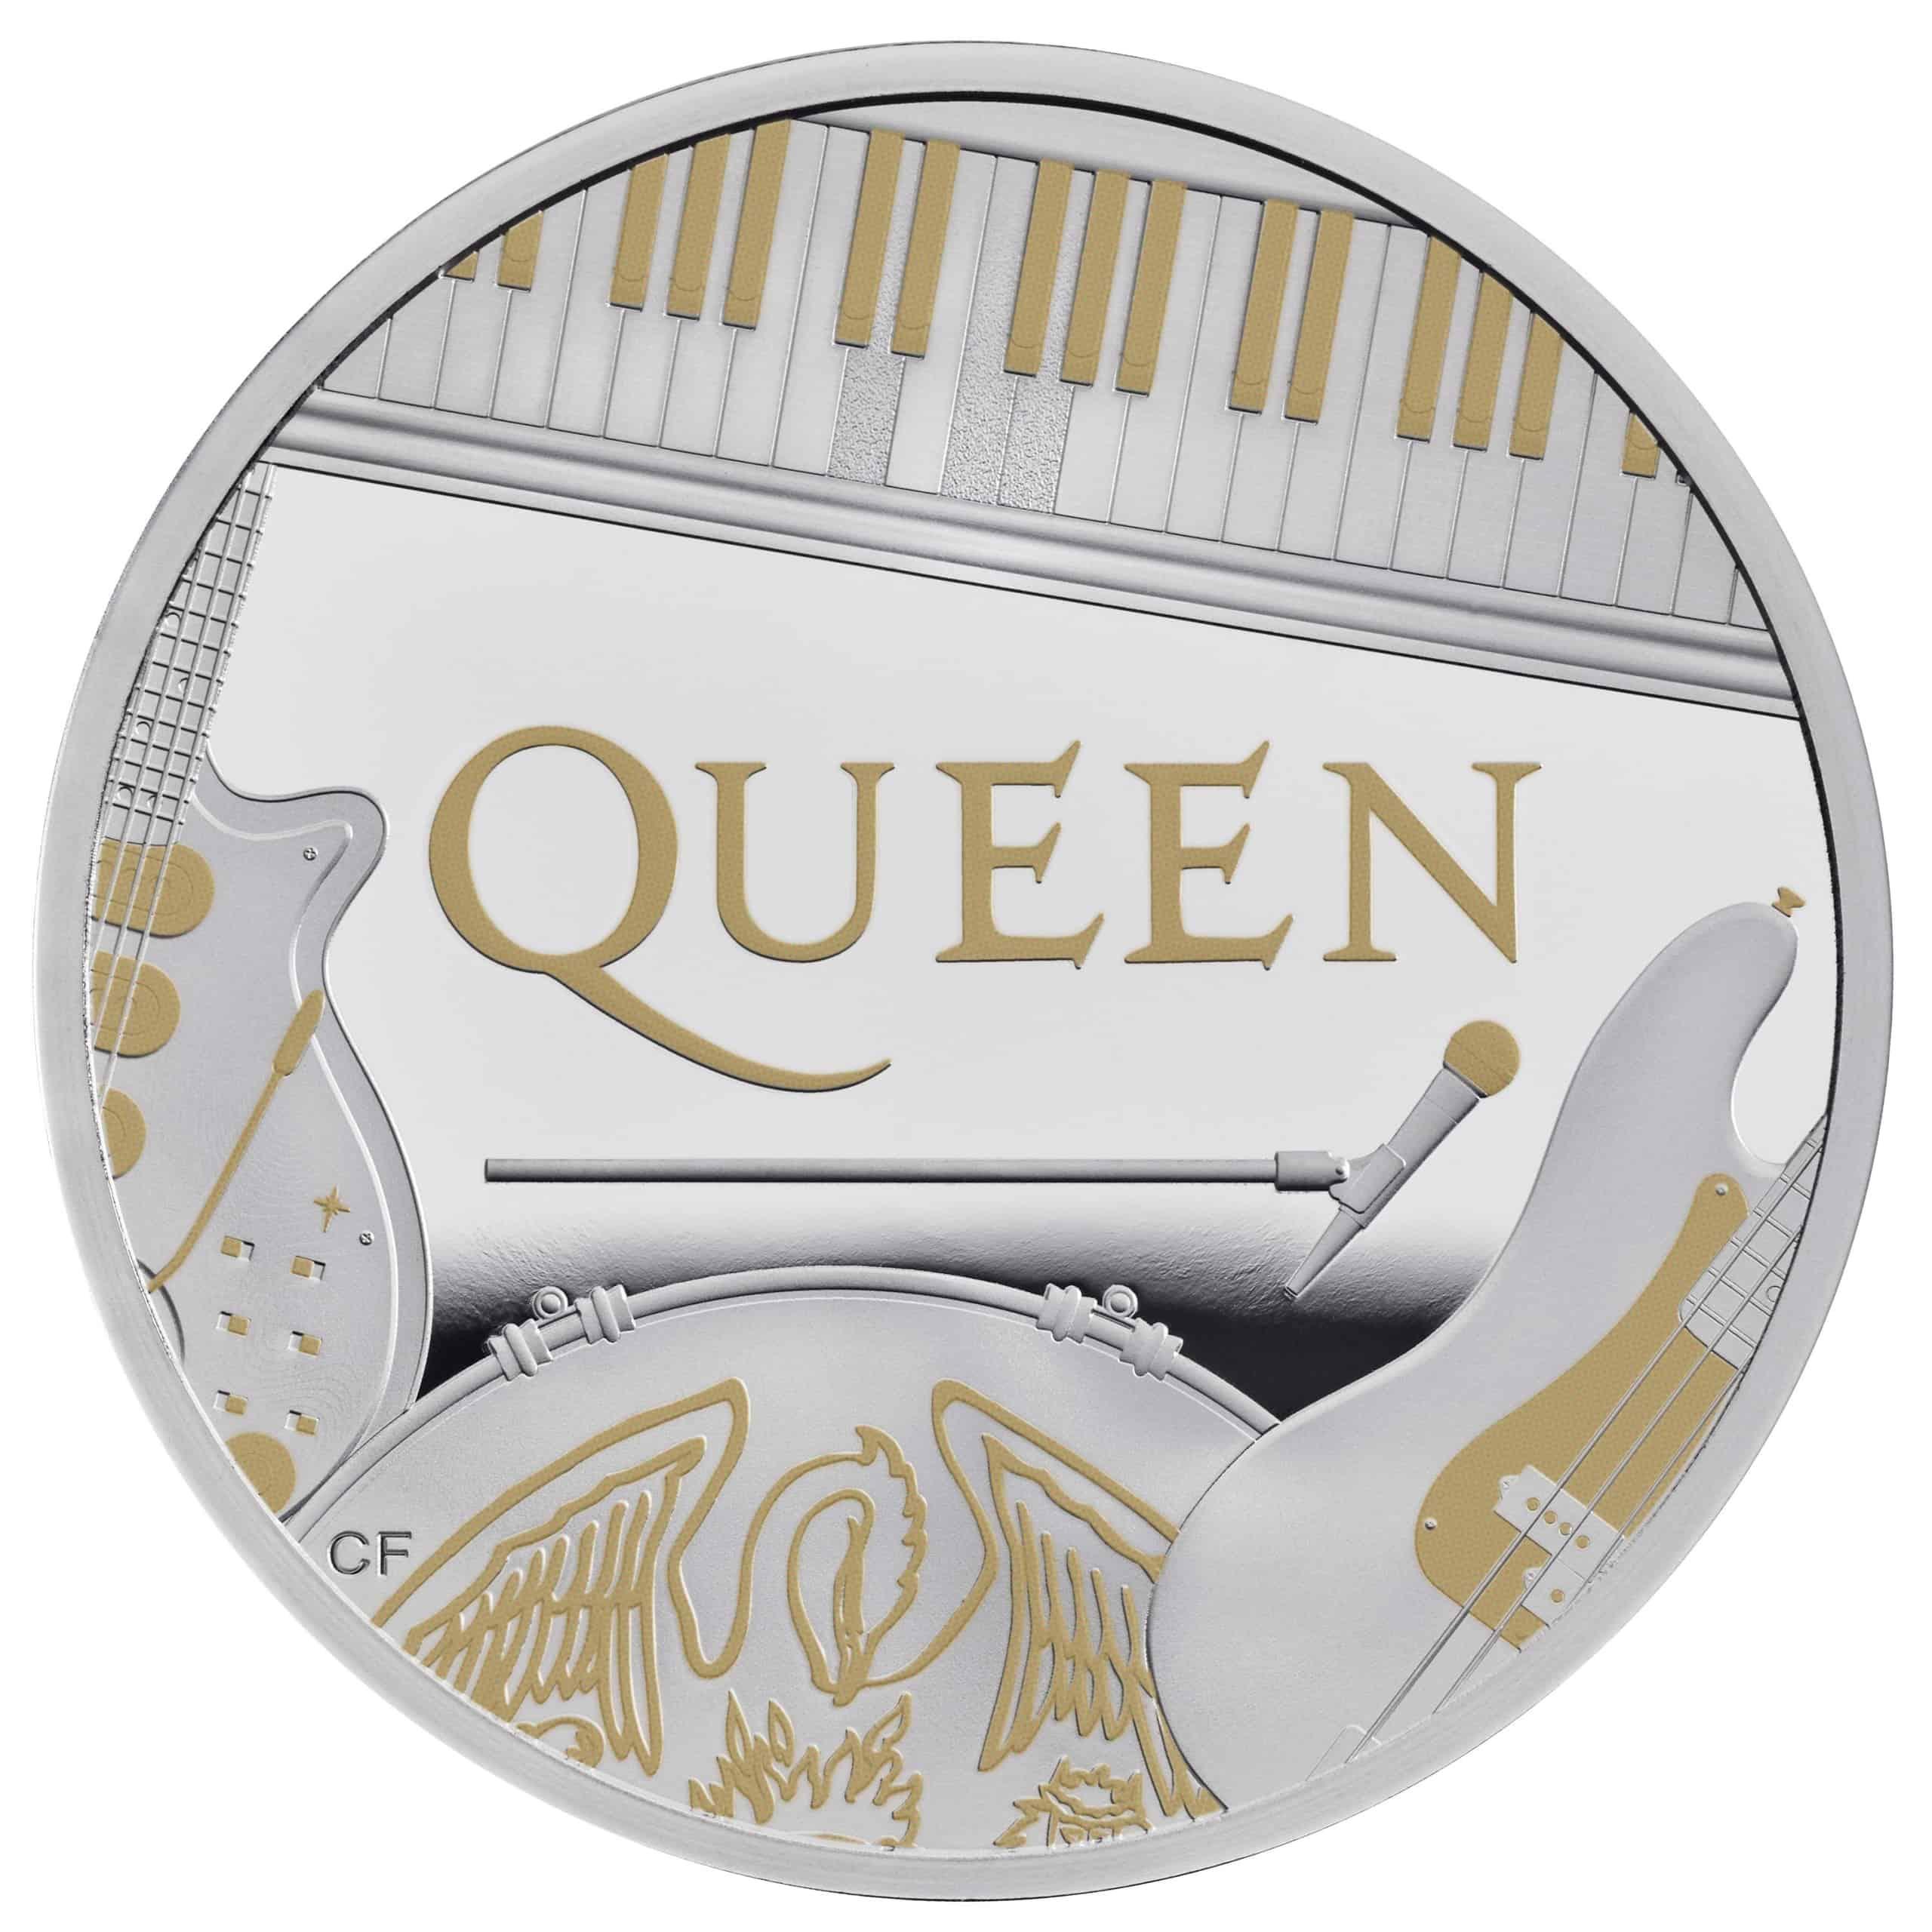 Wedding 2020 1oz Silver Proof Coin: Queen 2020 One Ounce Silver Proof Coin Box